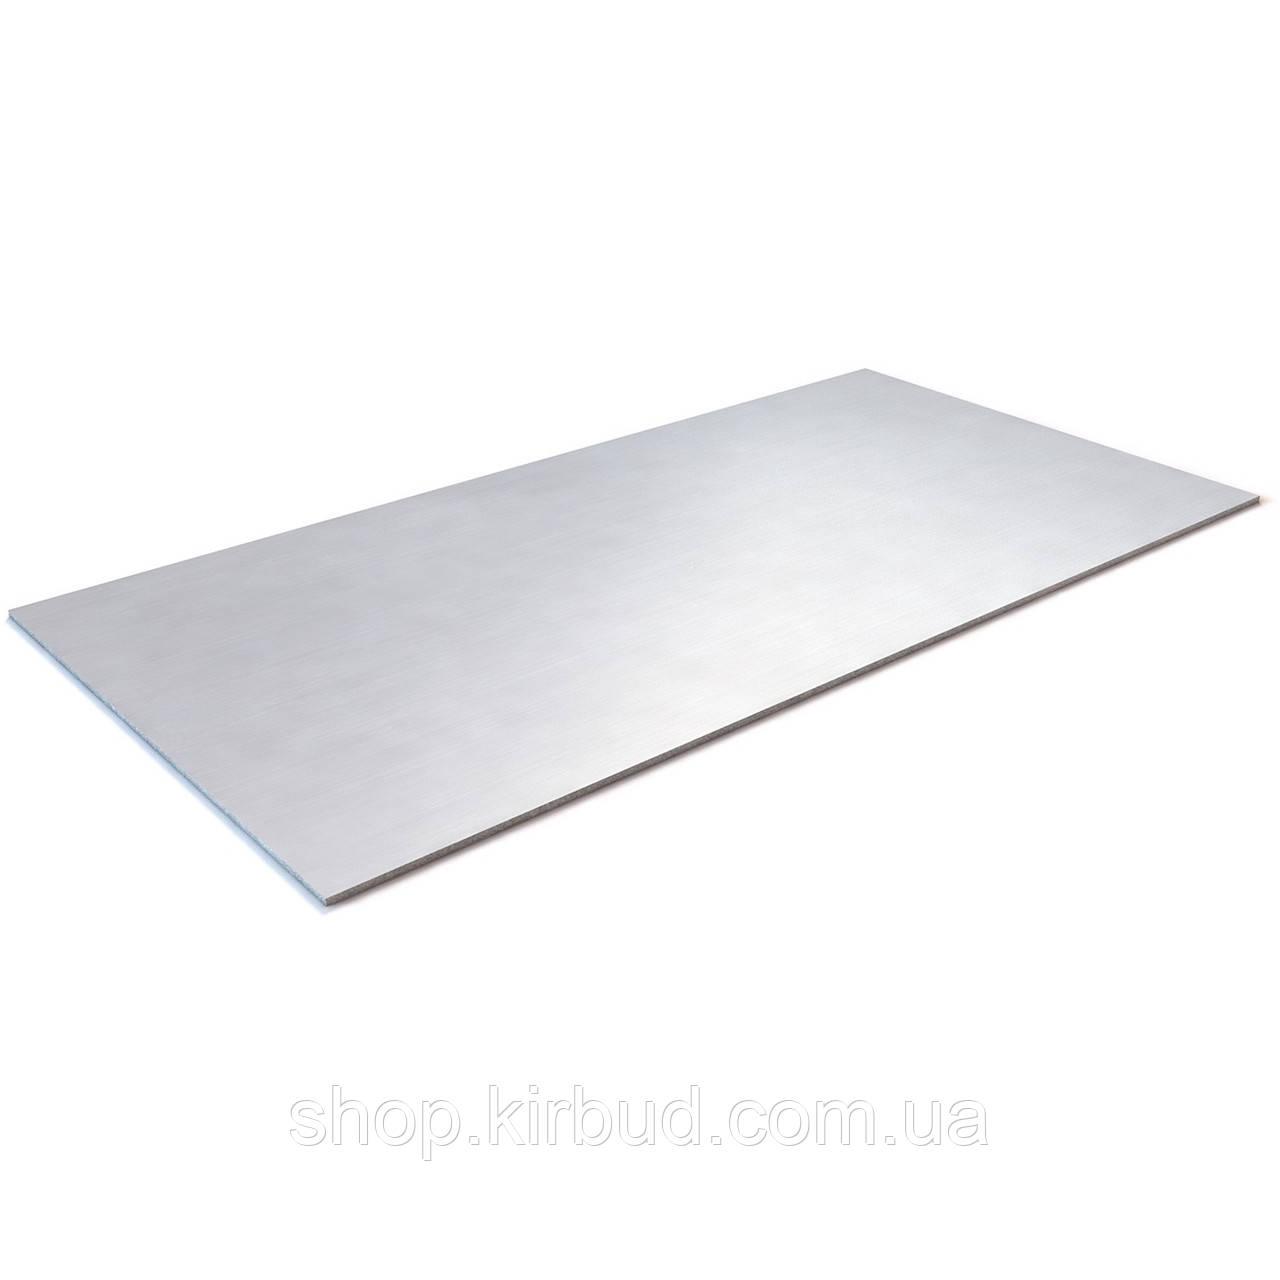 Лист х/к 1,5мм ст.08кп 1,25х2,5м